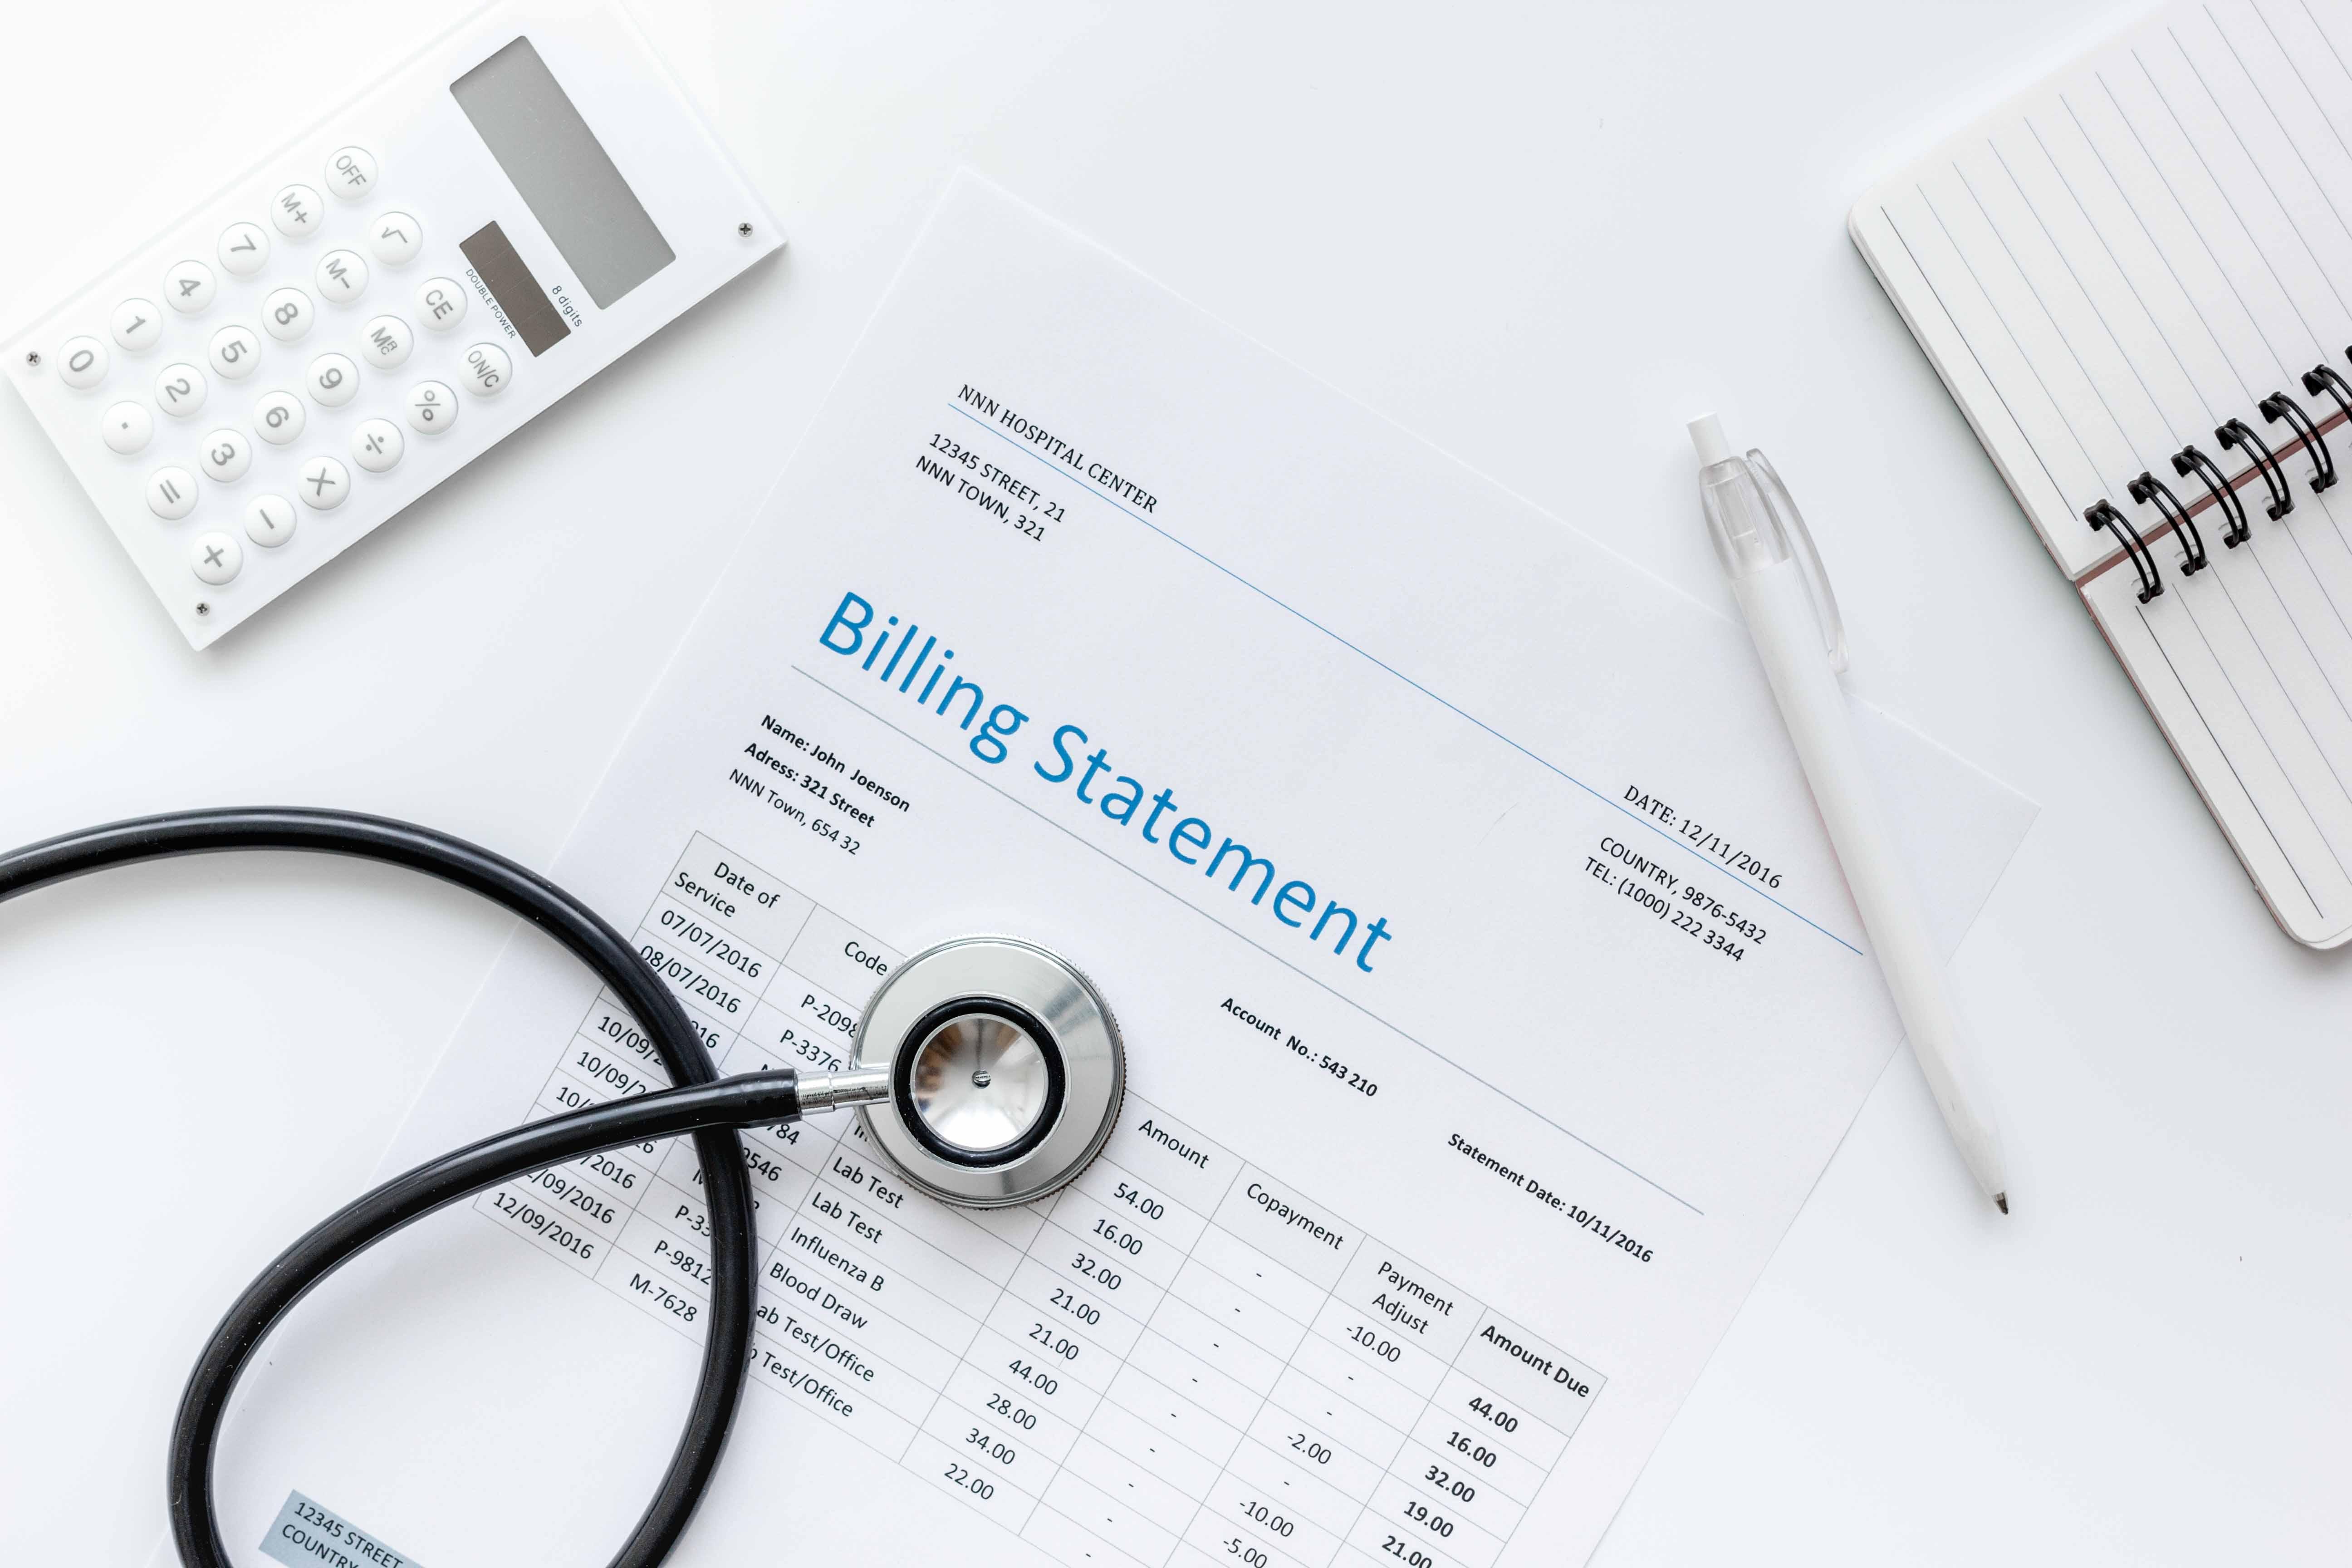 billing-statement-1